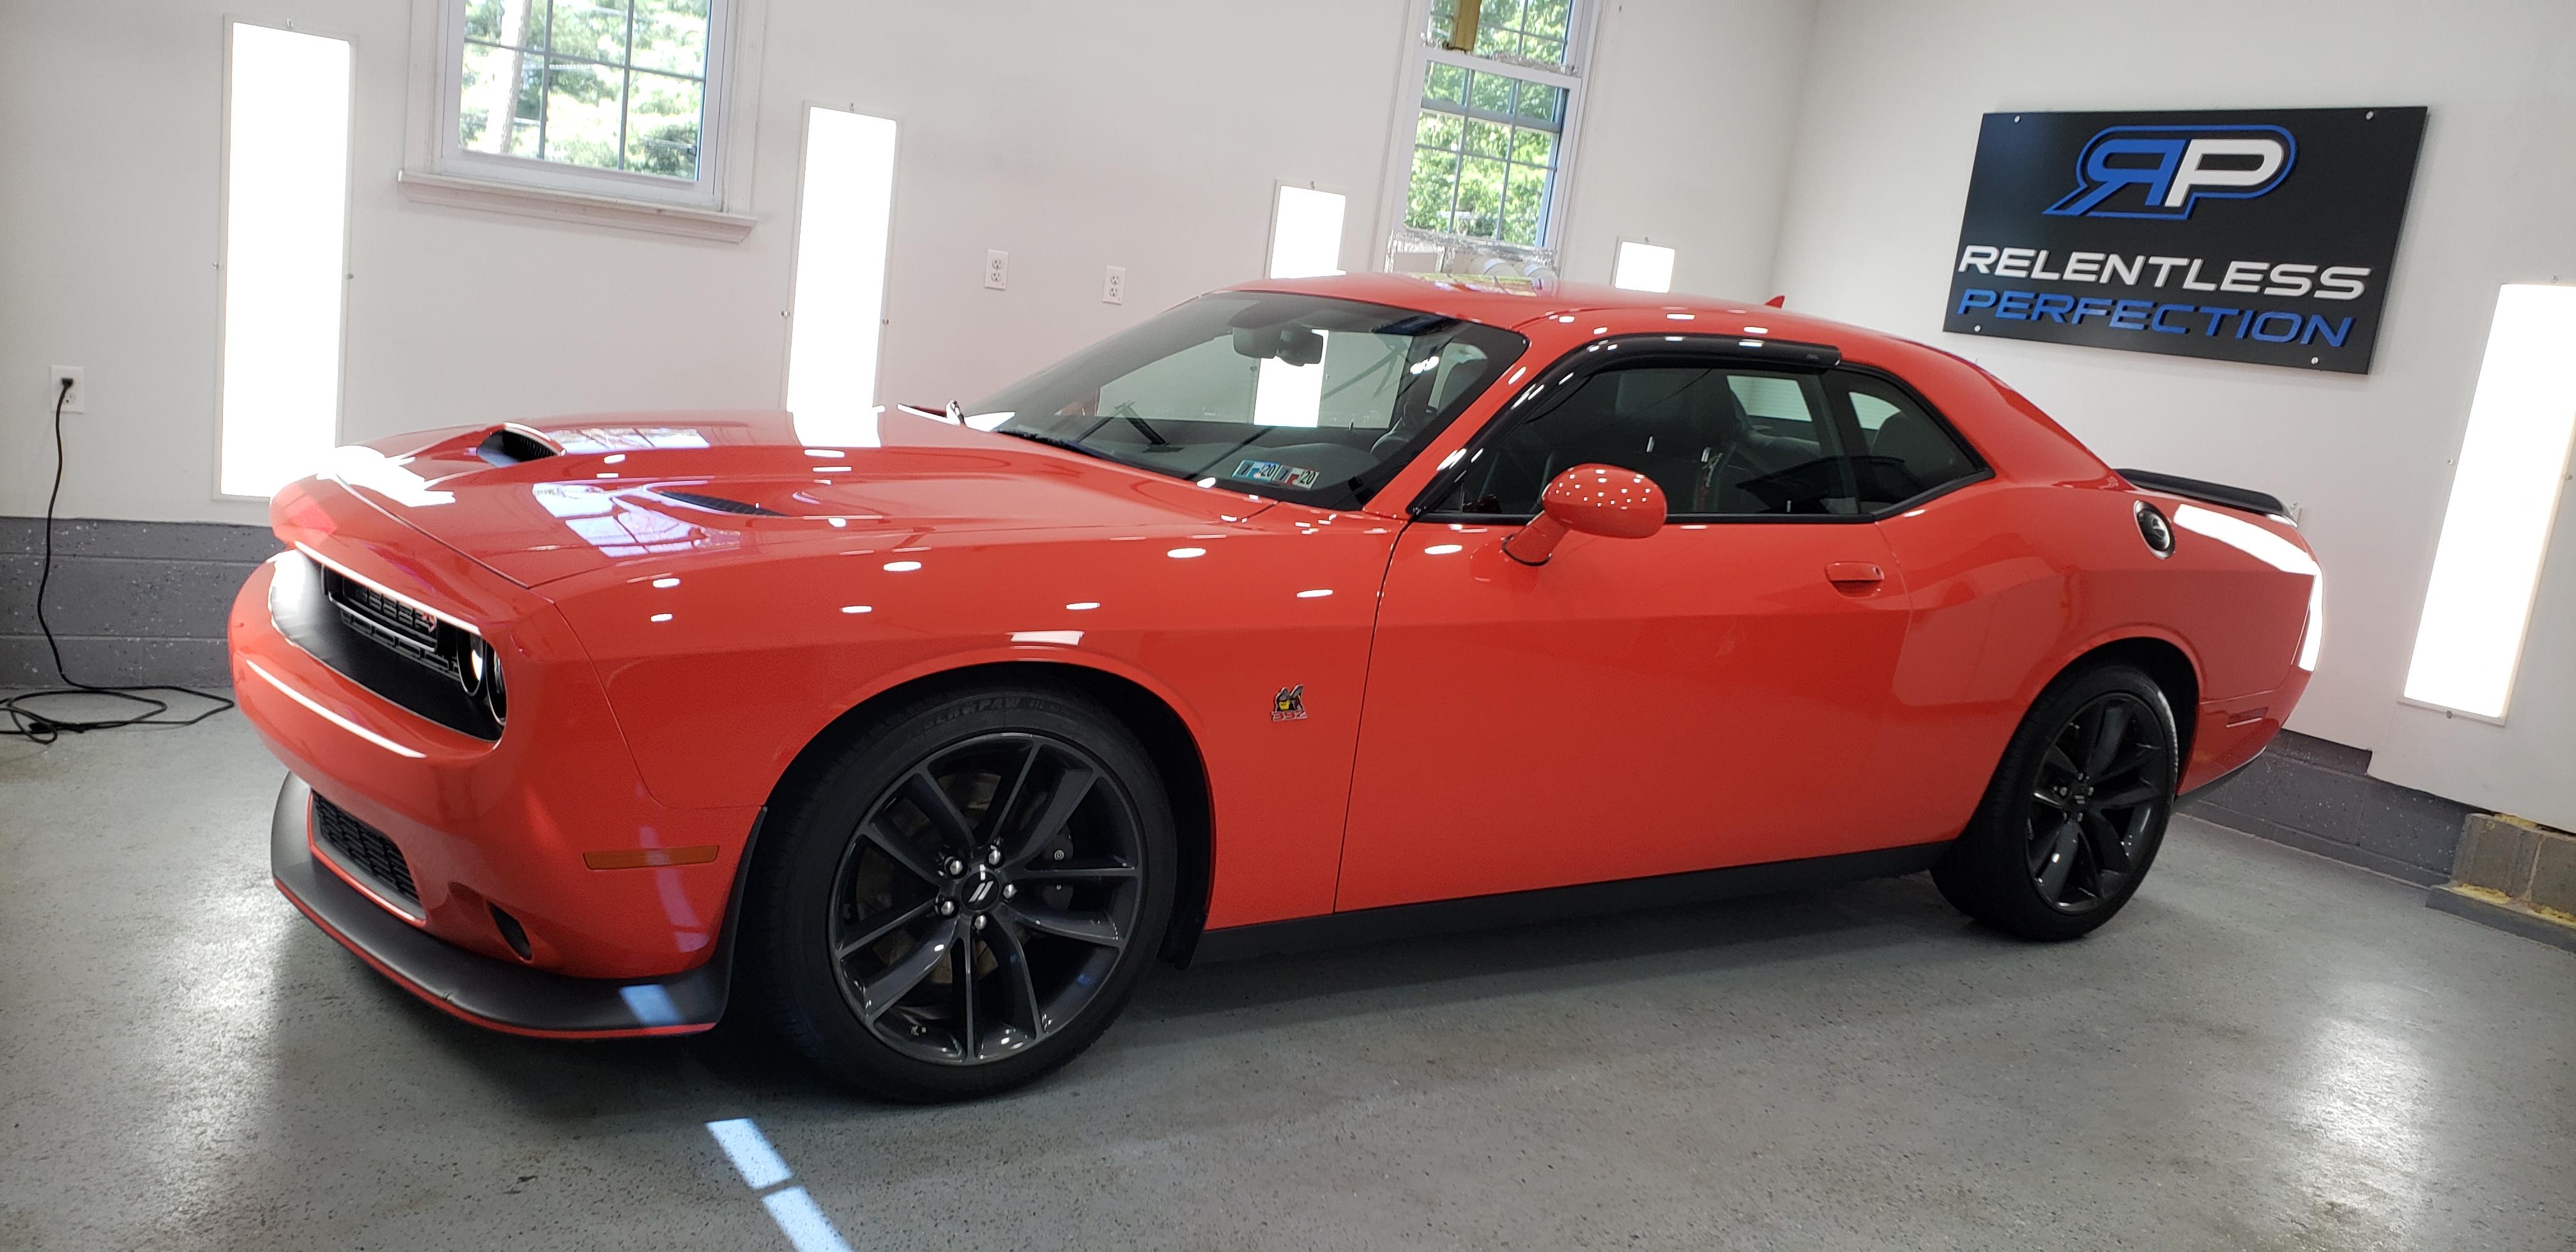 Orange Challenger ScatPack